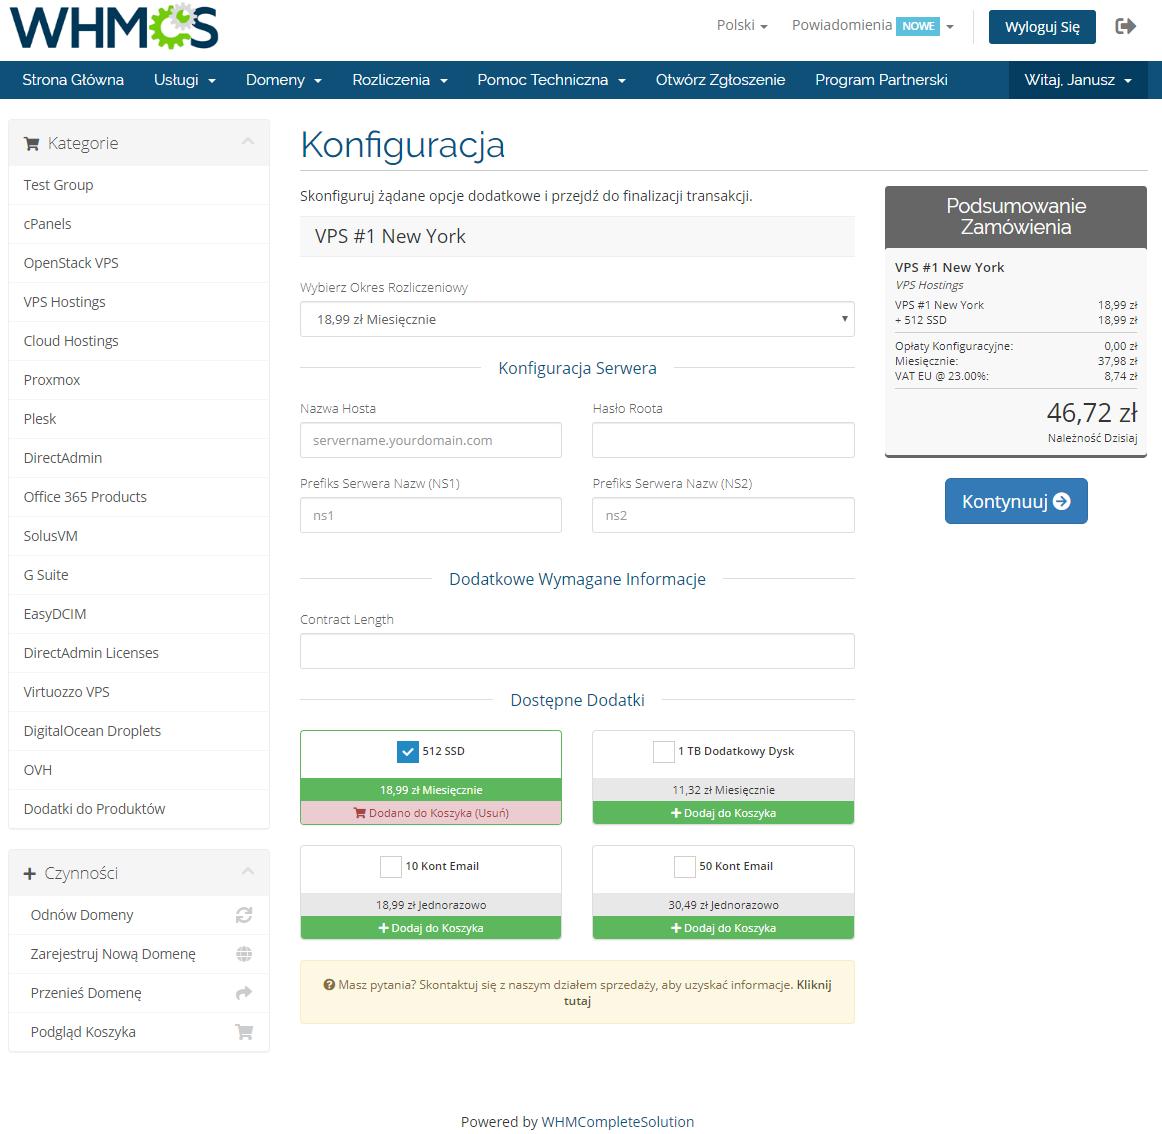 Polish Language Translation For WHMCS: Module Screenshot 9